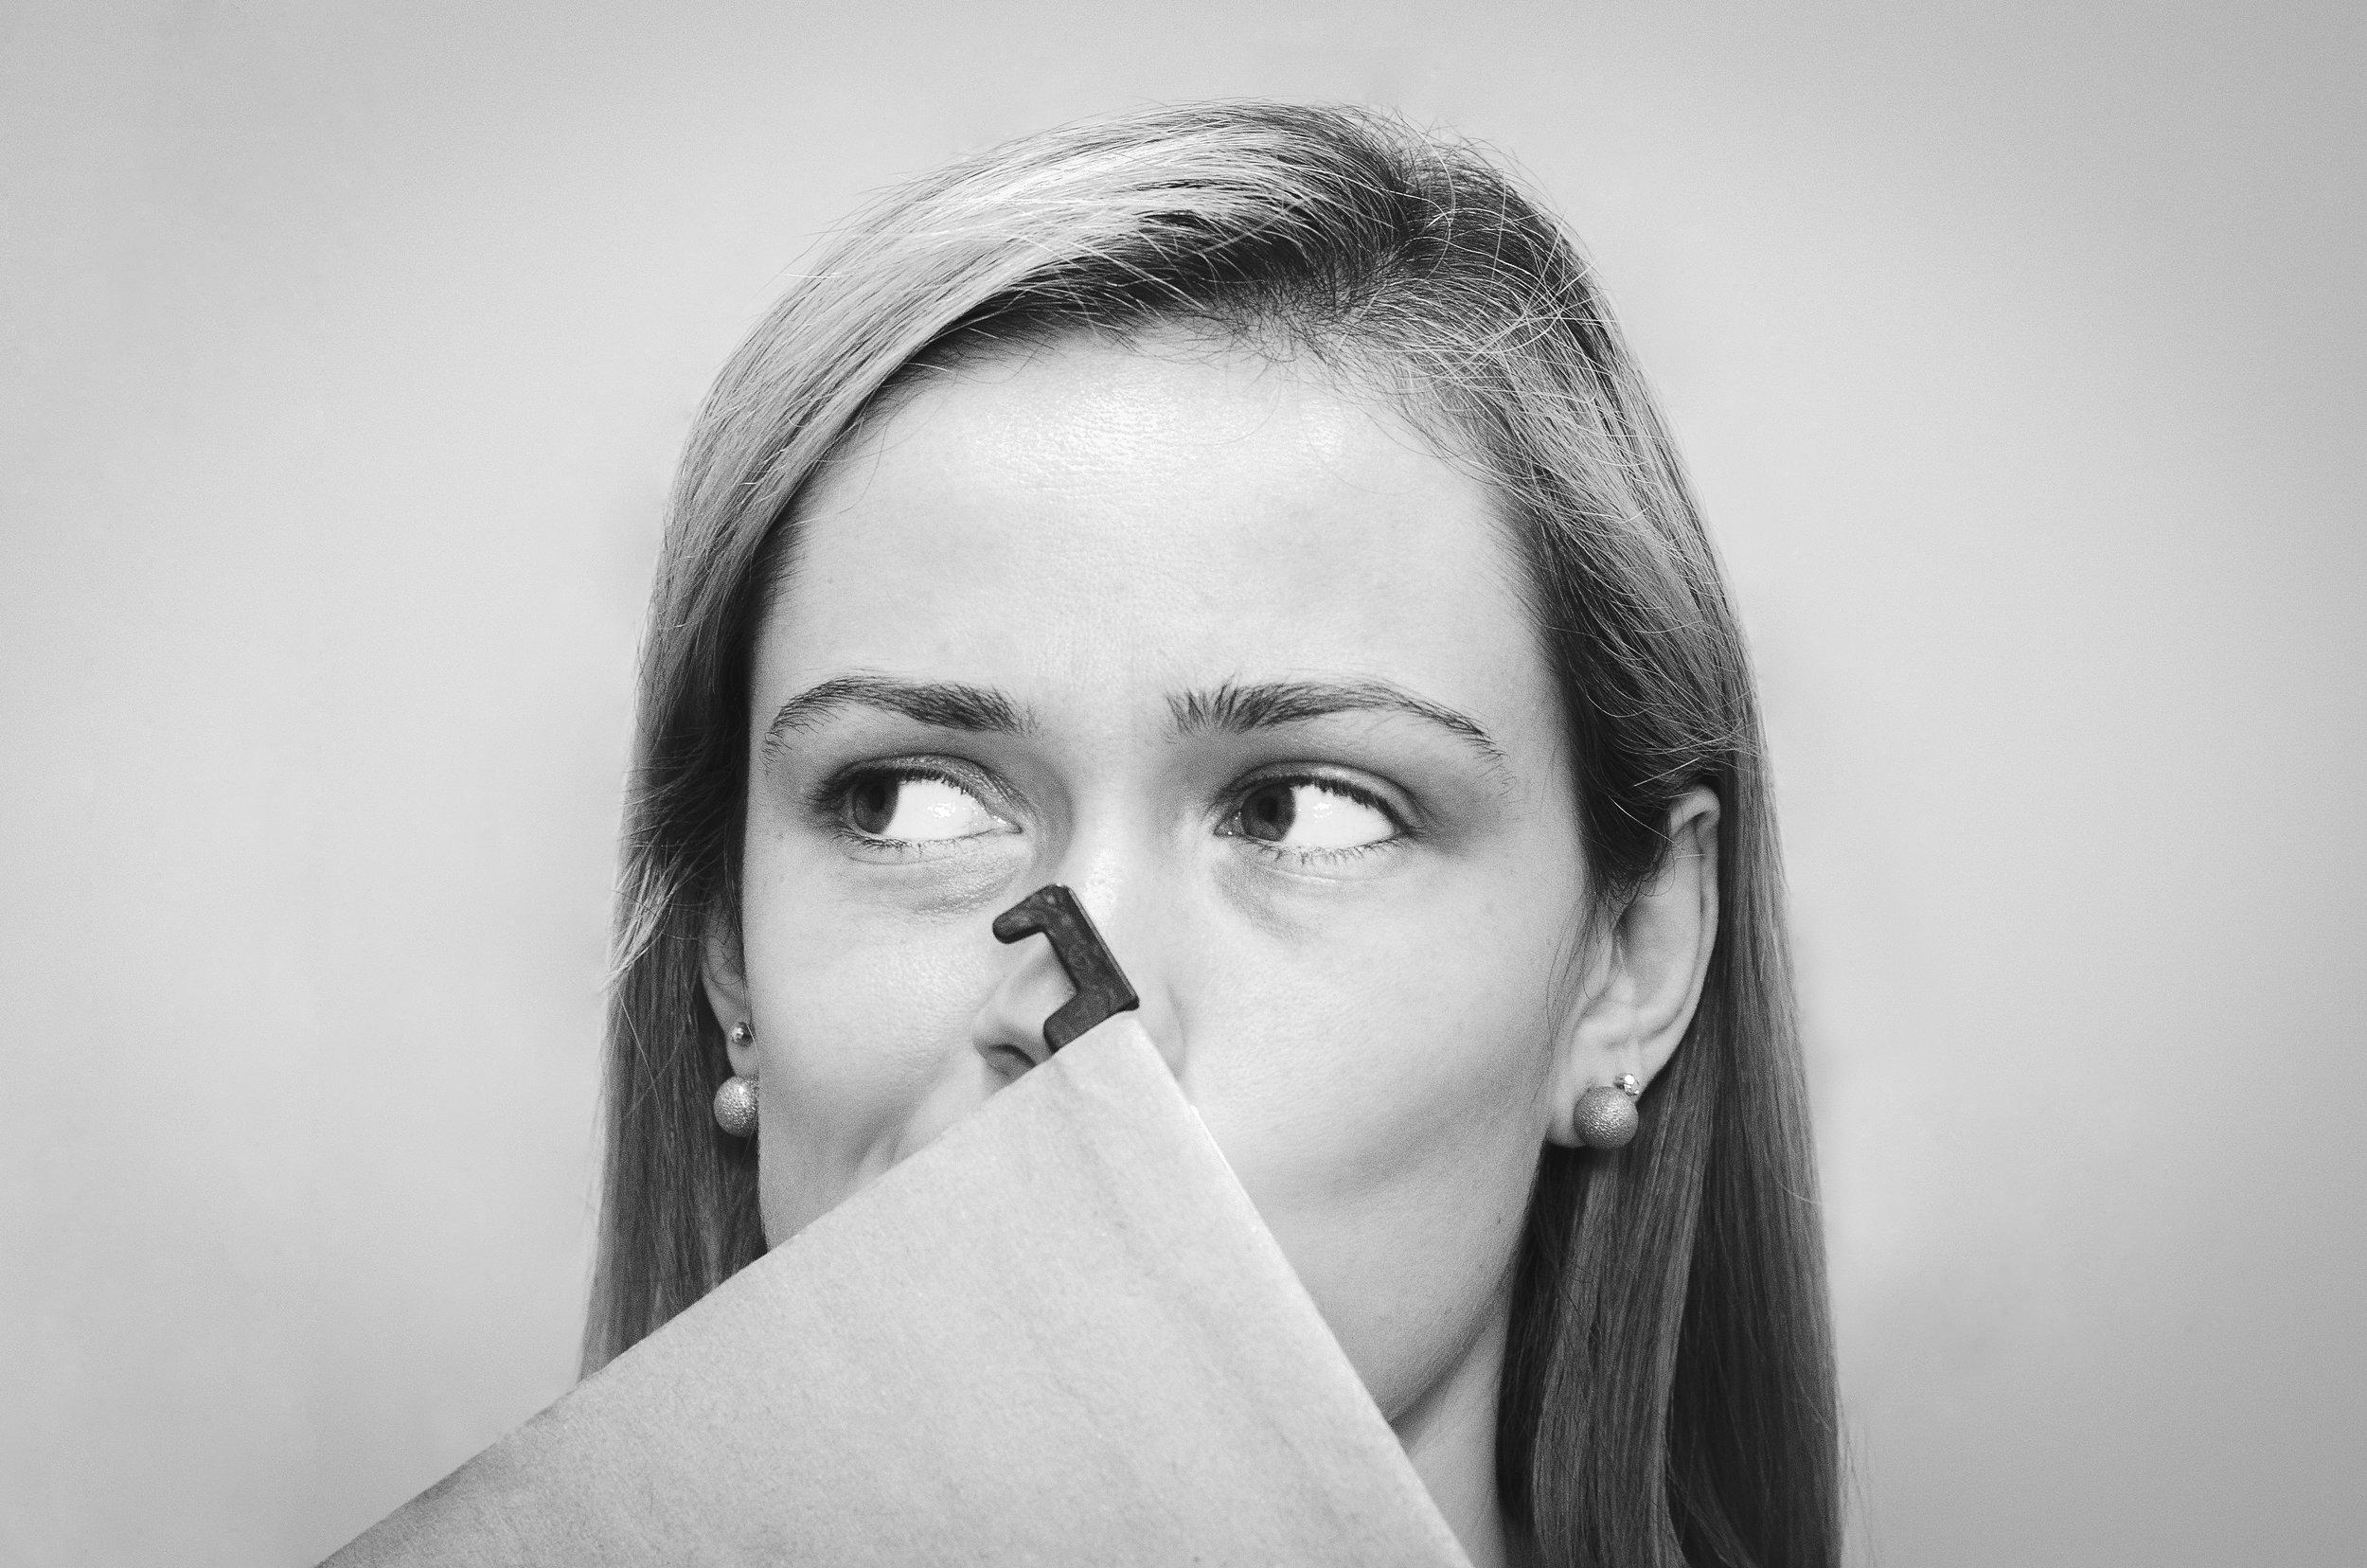 social anxiety rehab melbourne